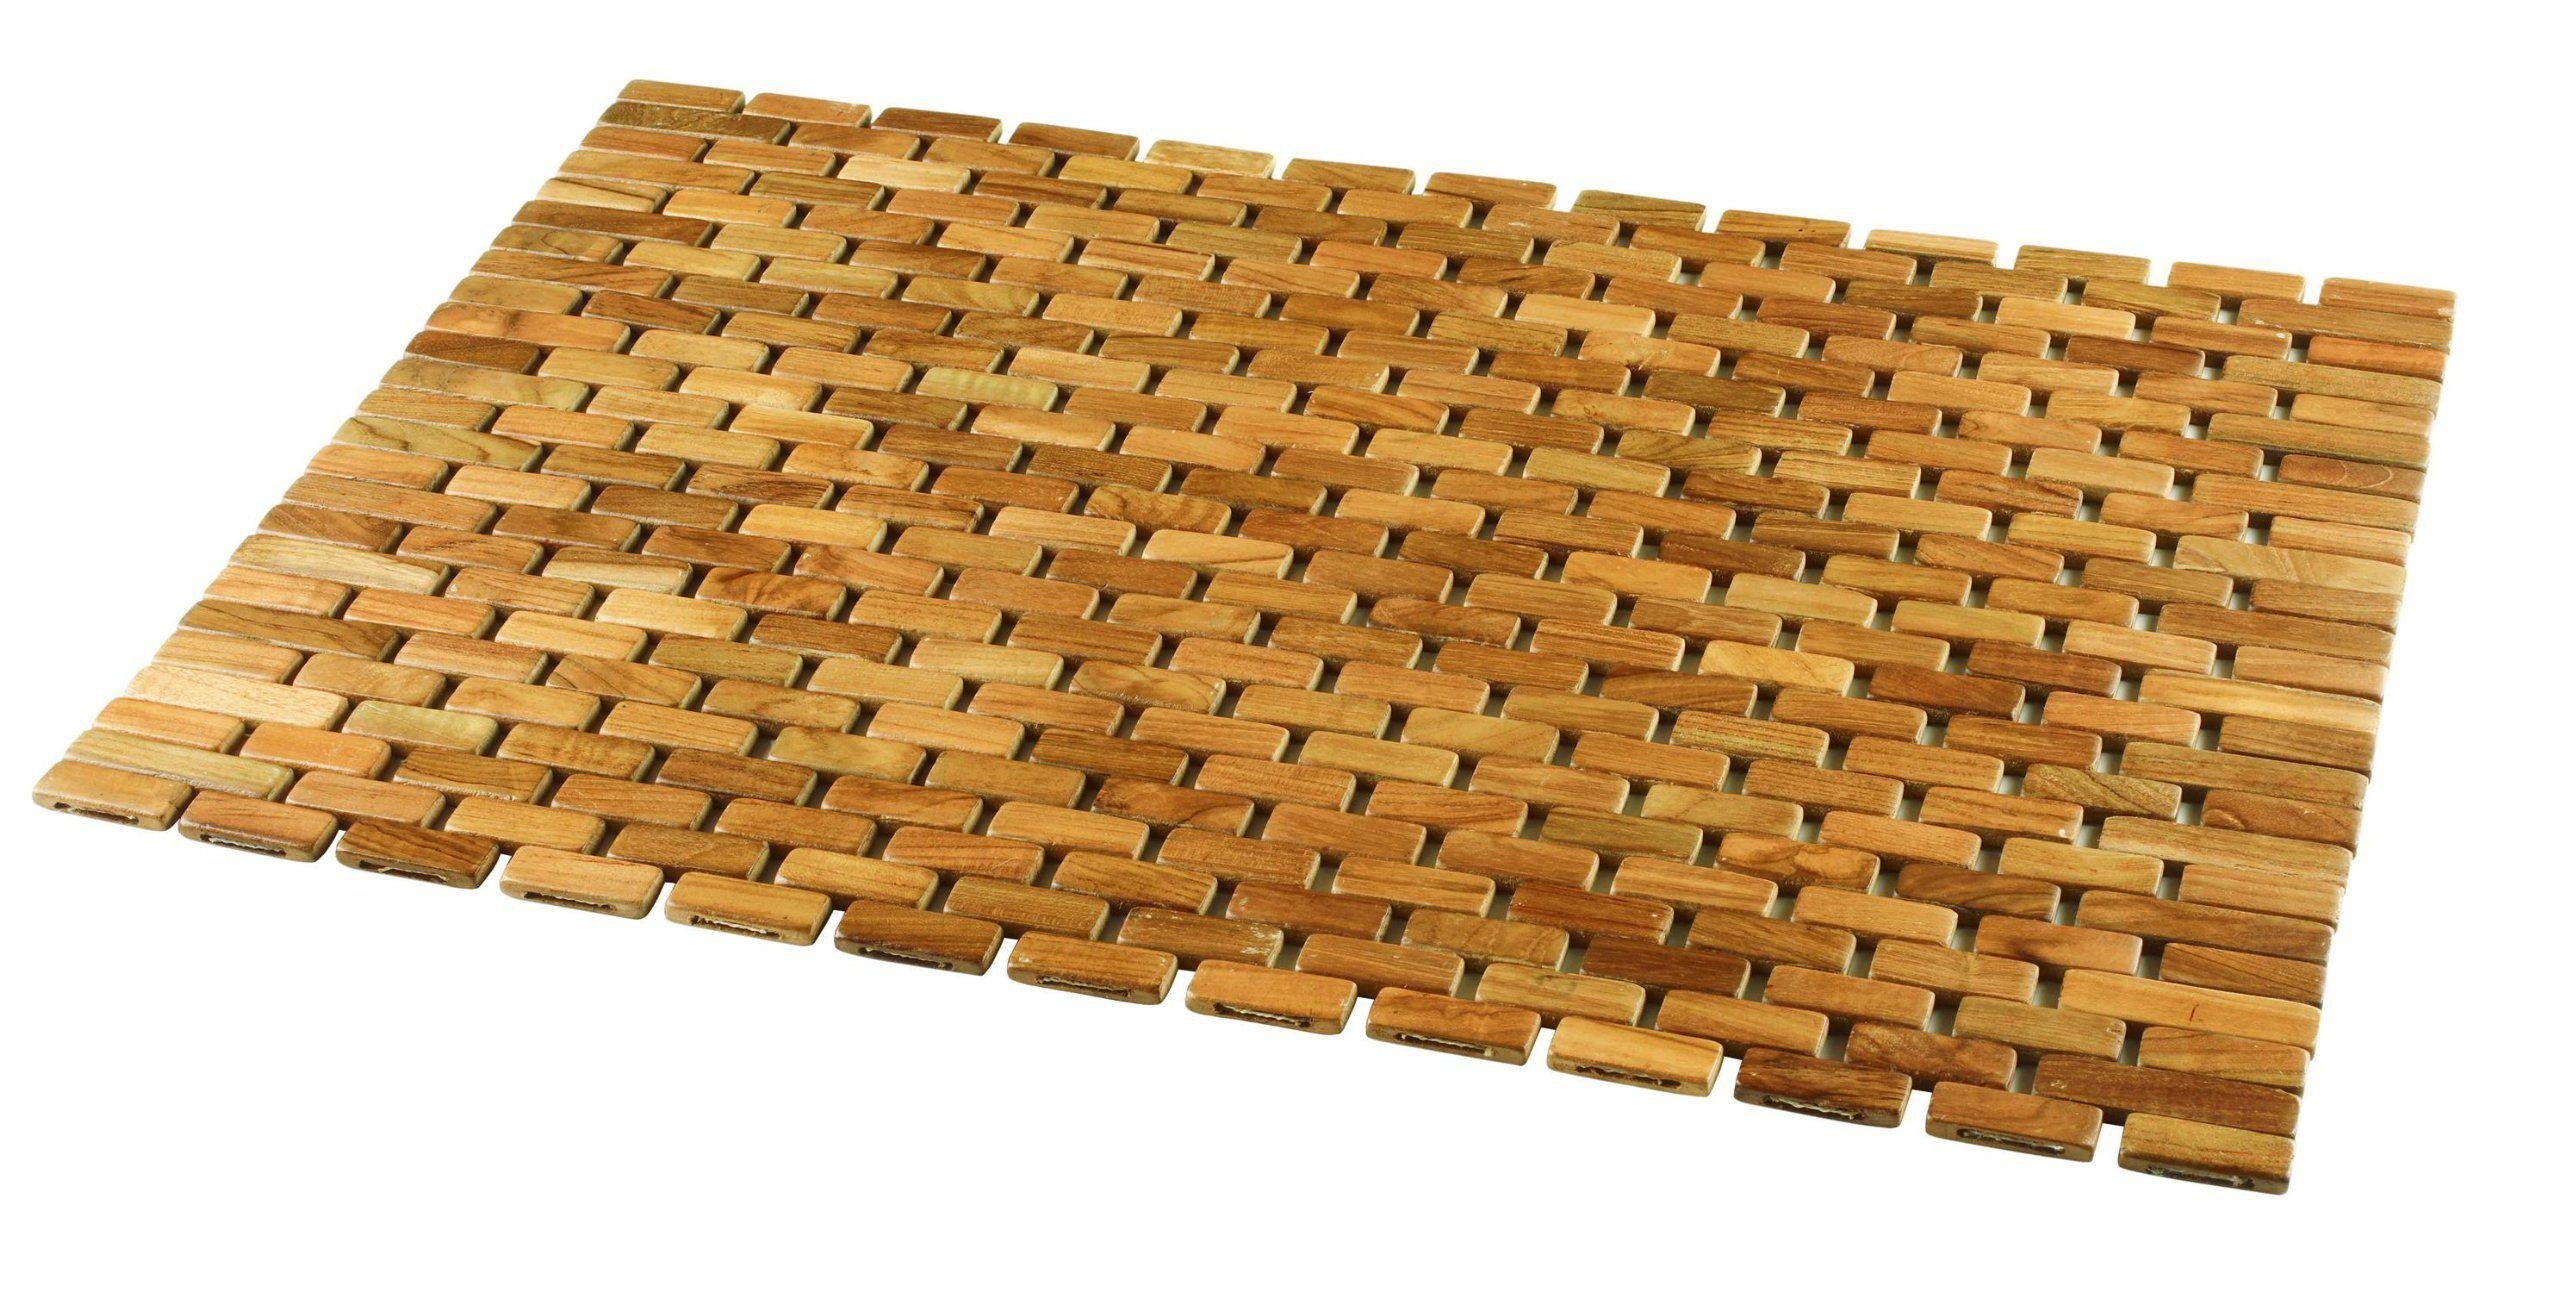 NEW Bamboo Wooden Folding Bath Mat Slatted Duck Board Non Slip Shower  Bathroom | Shower Bathroom, Bath Mat And Bath.